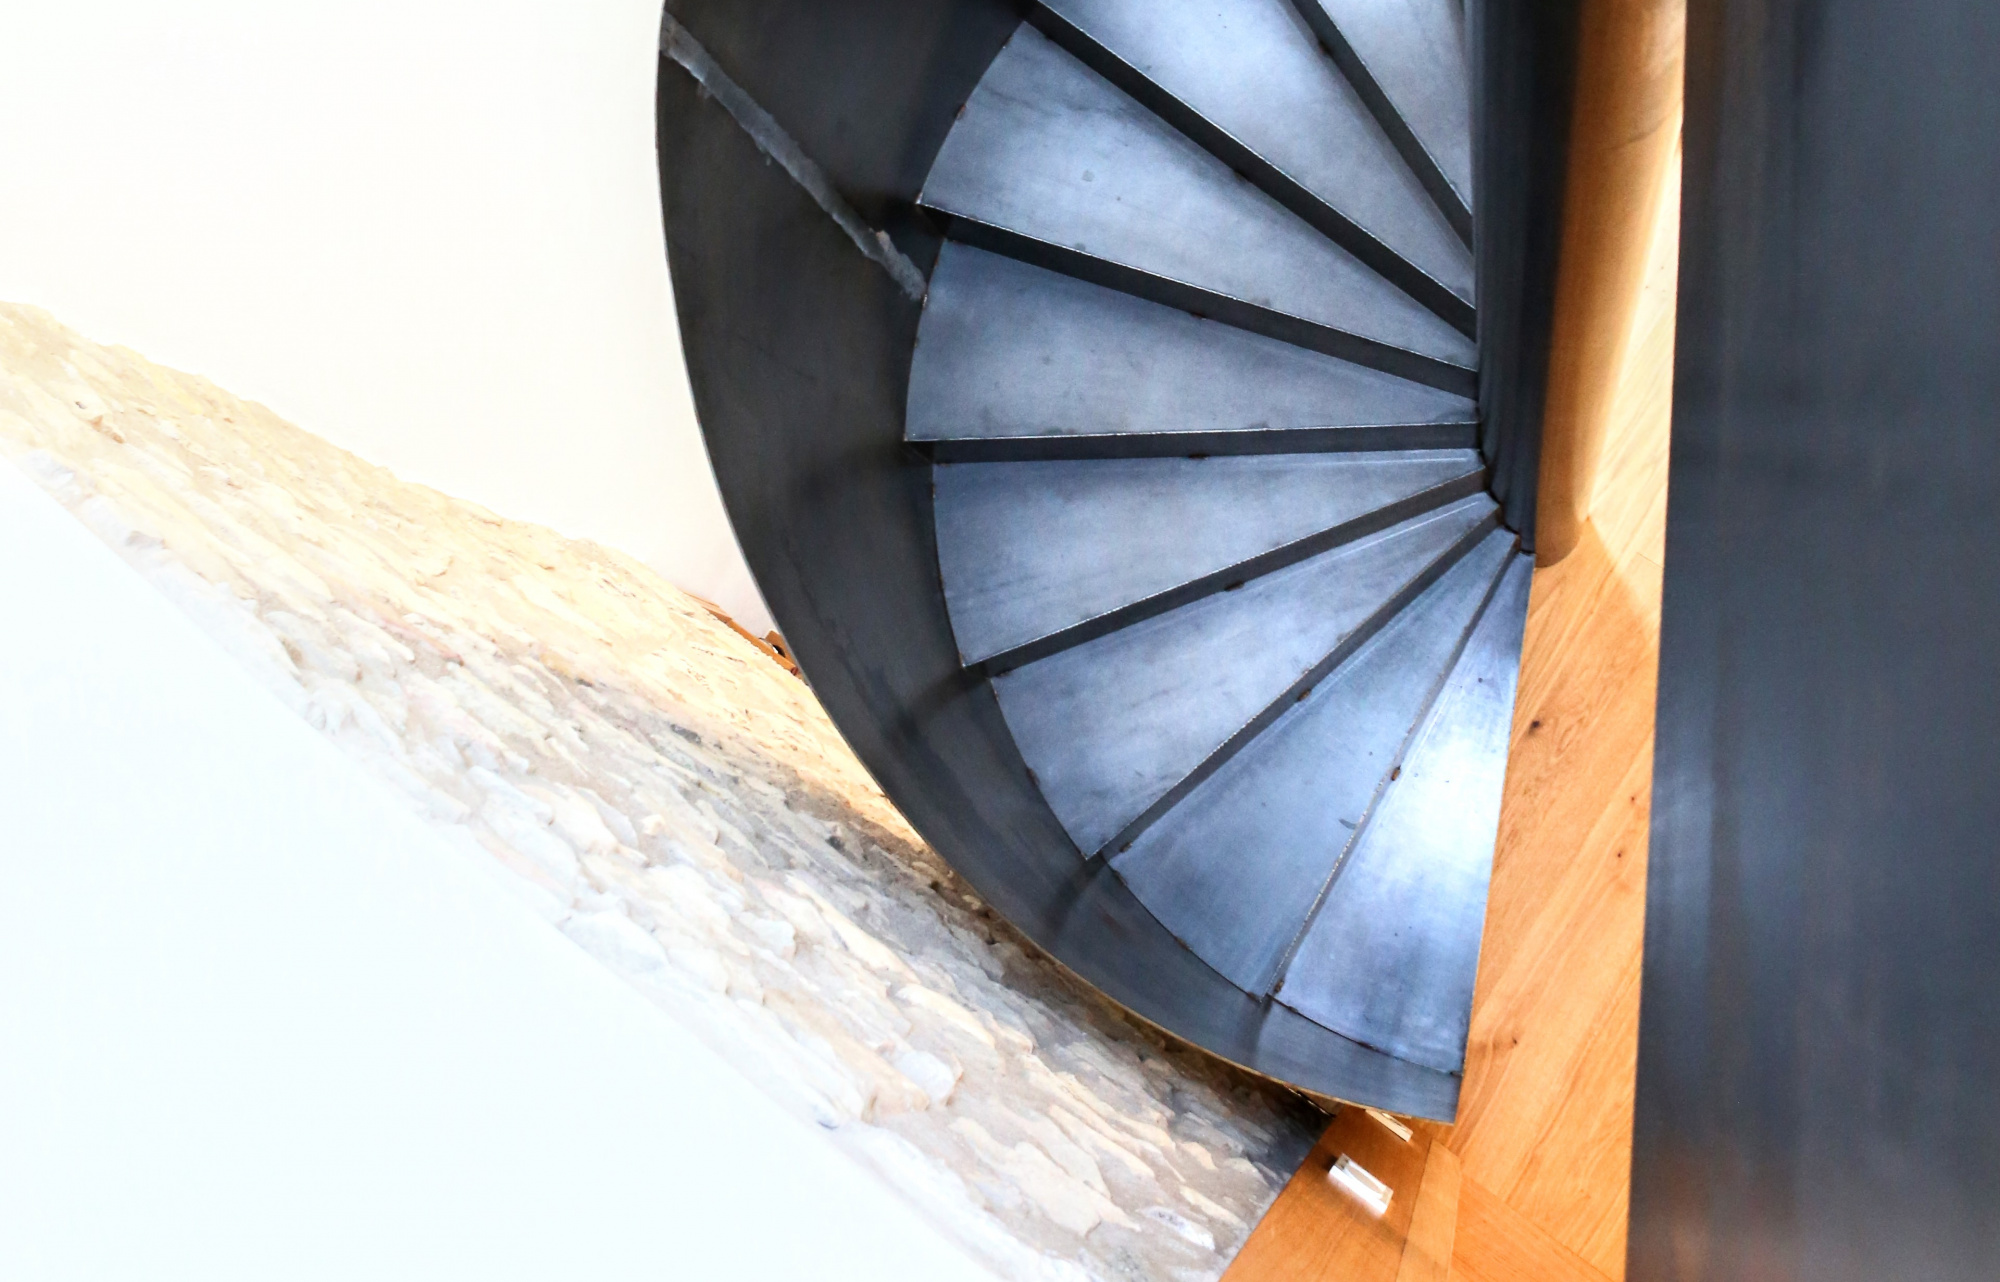 ateliers conselman metallerie bous, ferronerie d`art luxembourg, menuiserie metallique